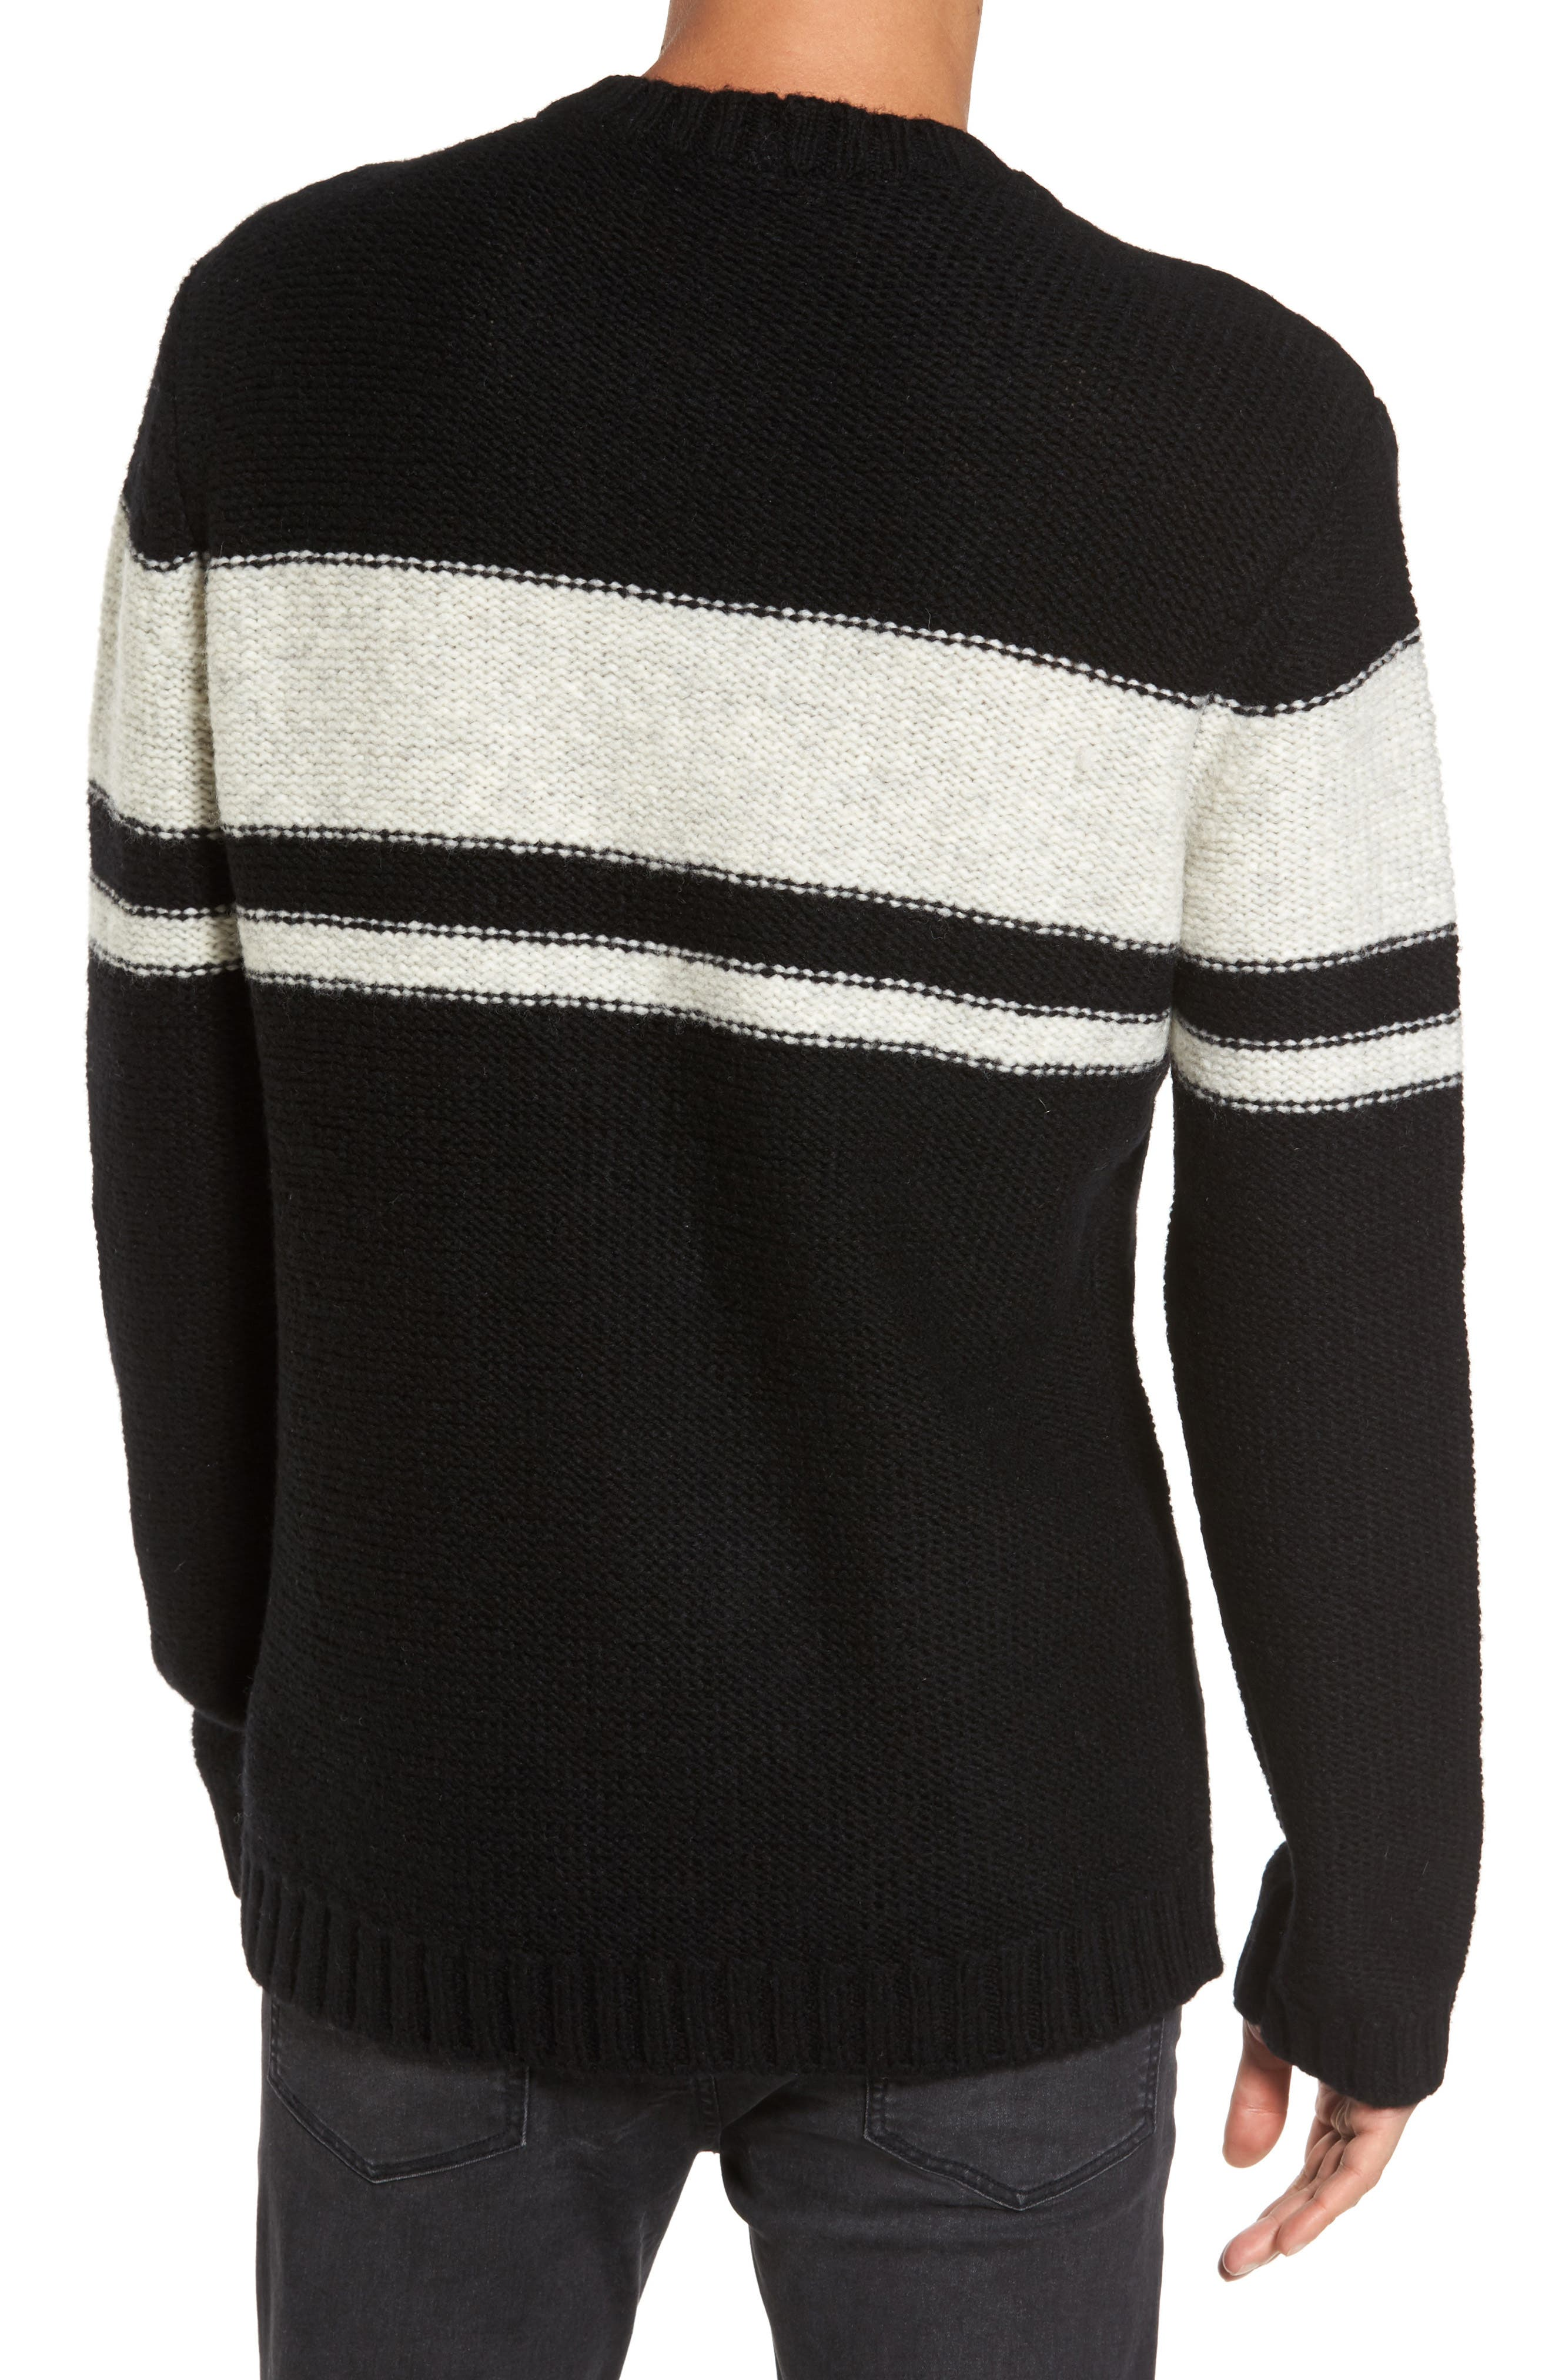 Blume Sweater,                             Alternate thumbnail 2, color,                             Black Boom